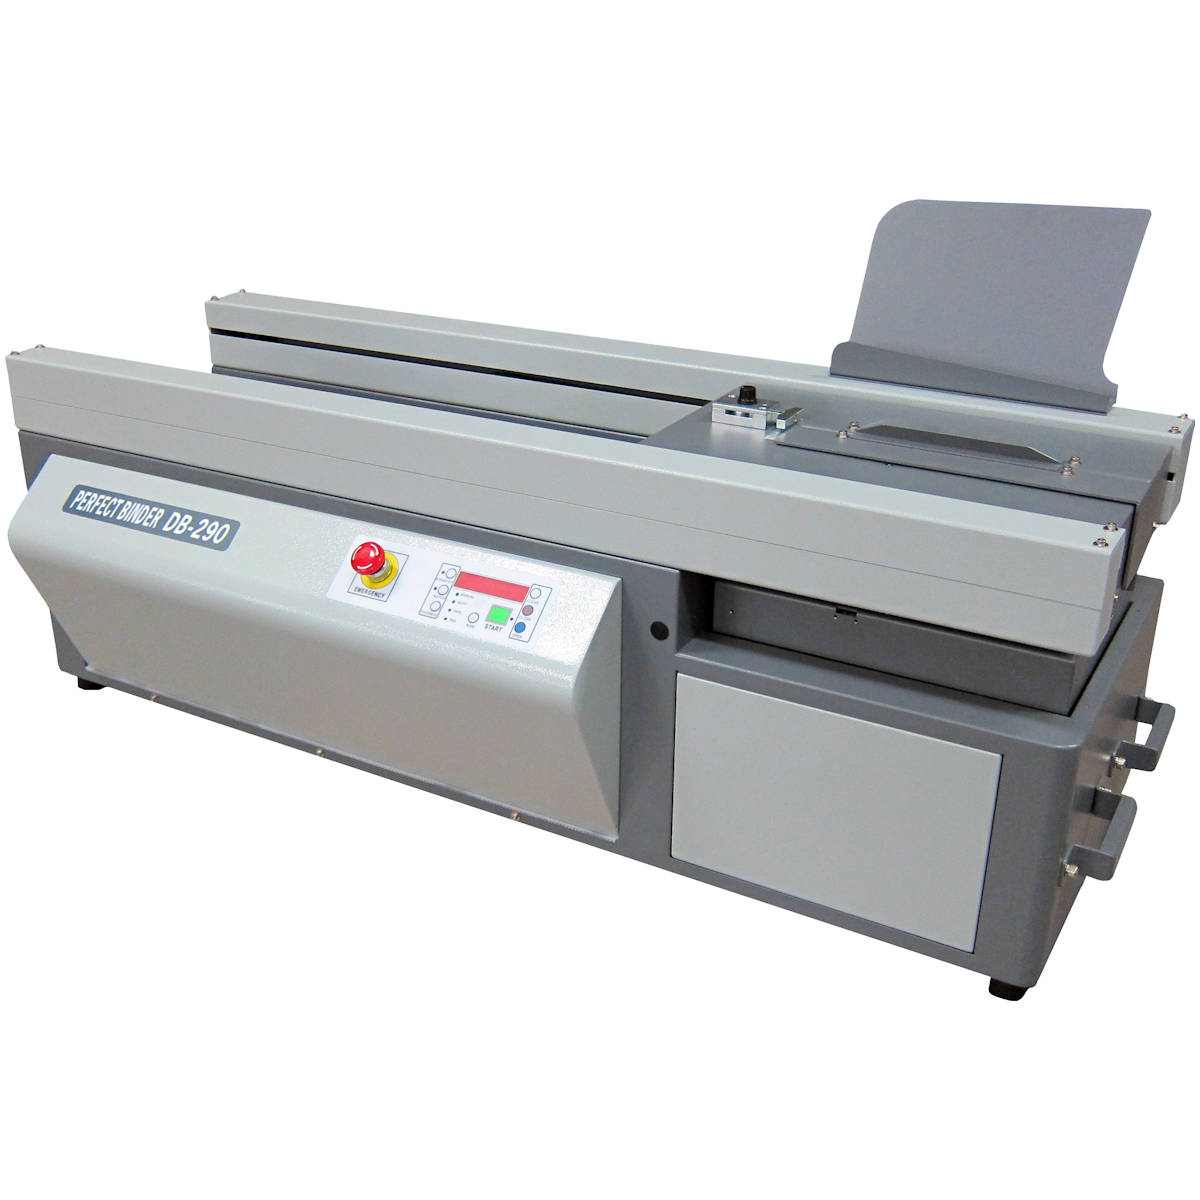 duplo-db-290-perfect-binder-1200.png